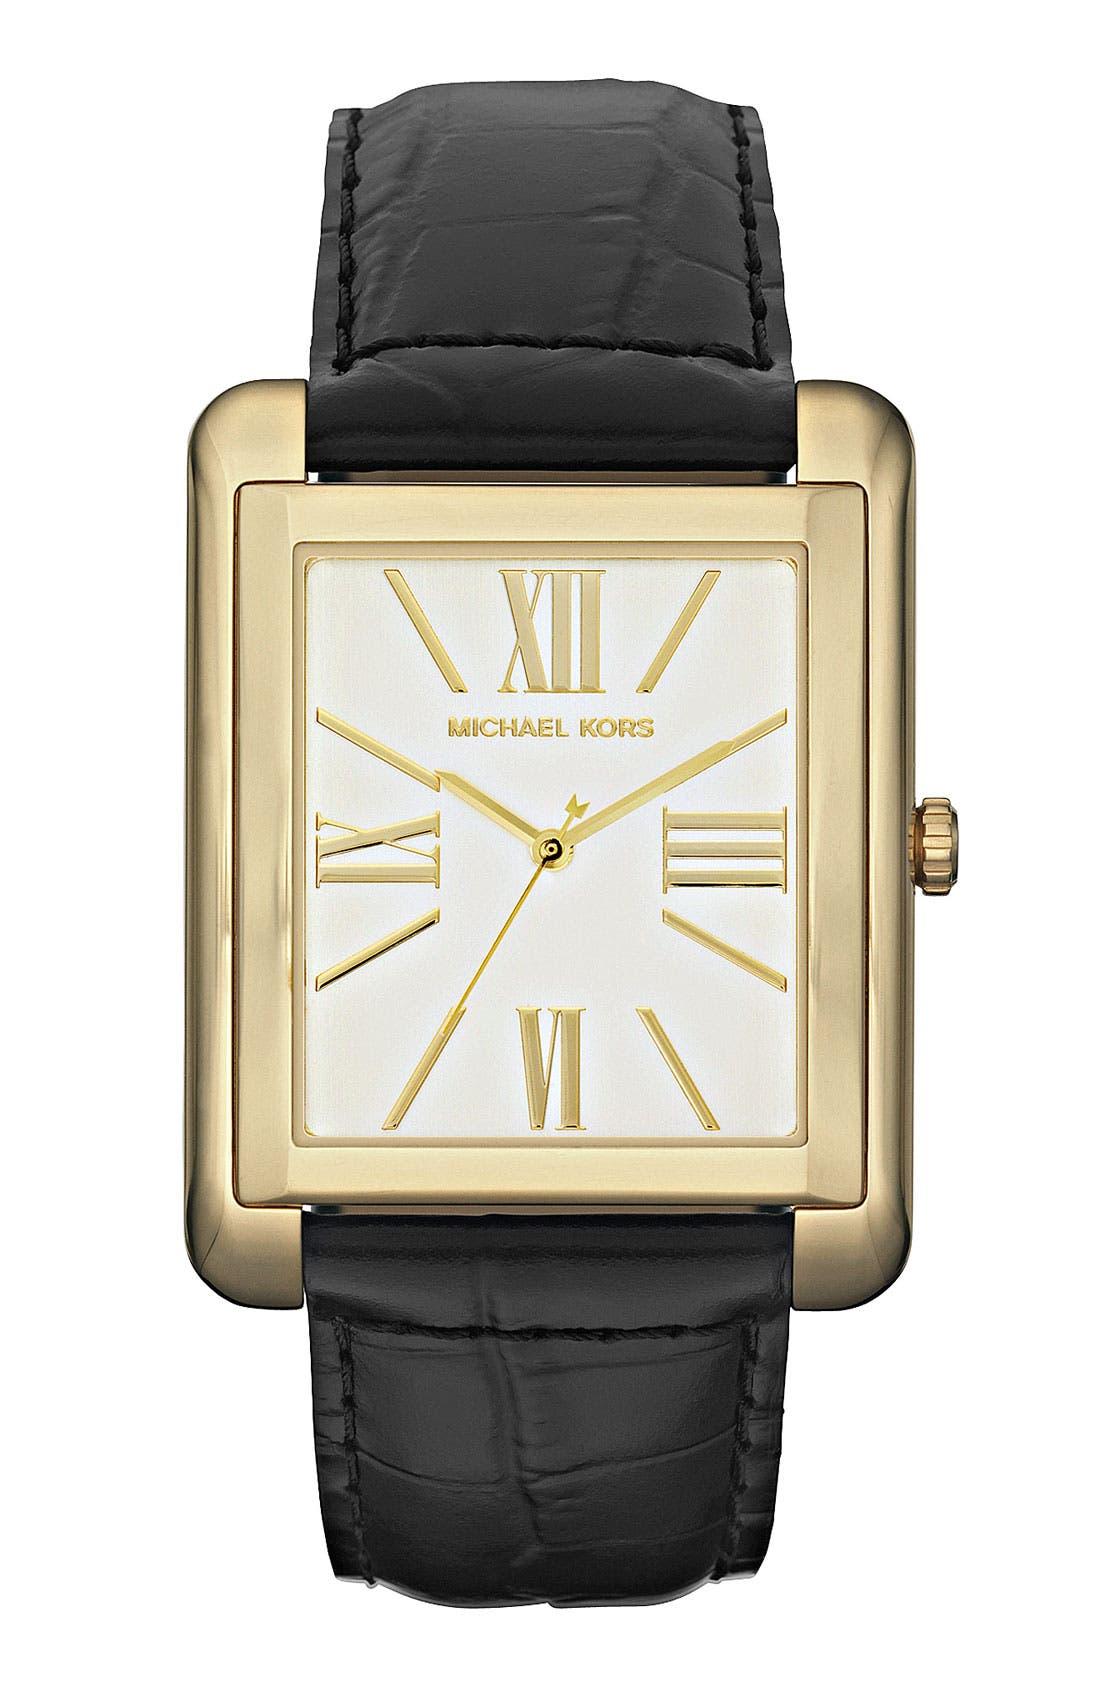 Michael Kors 'Bradley' Leather Strap Watch,                             Main thumbnail 1, color,                             001